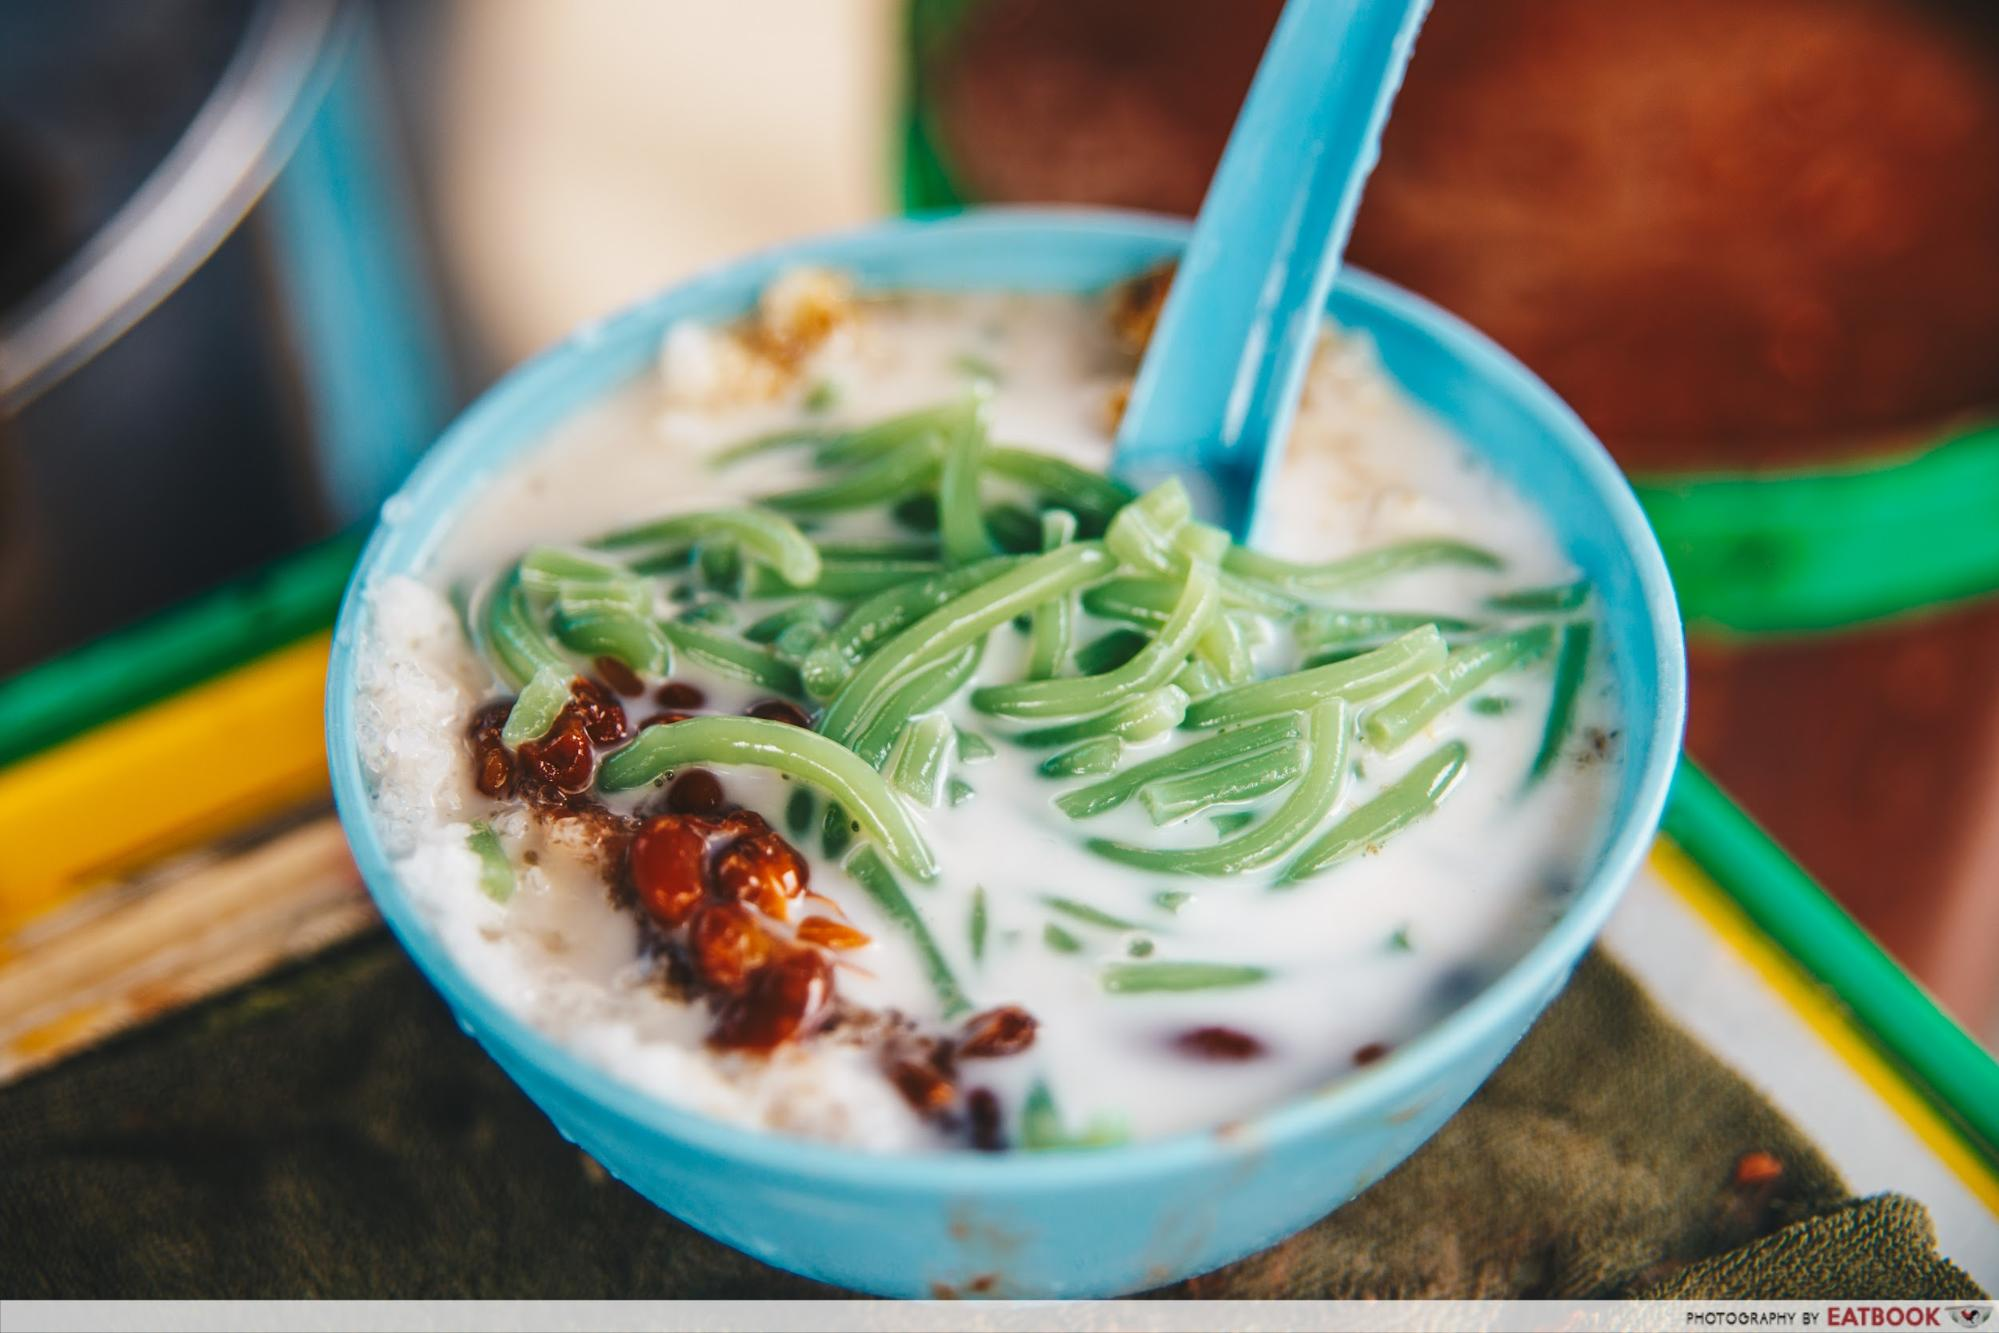 Penang Hawker Food - Penang Road Famous Teochew Chendol